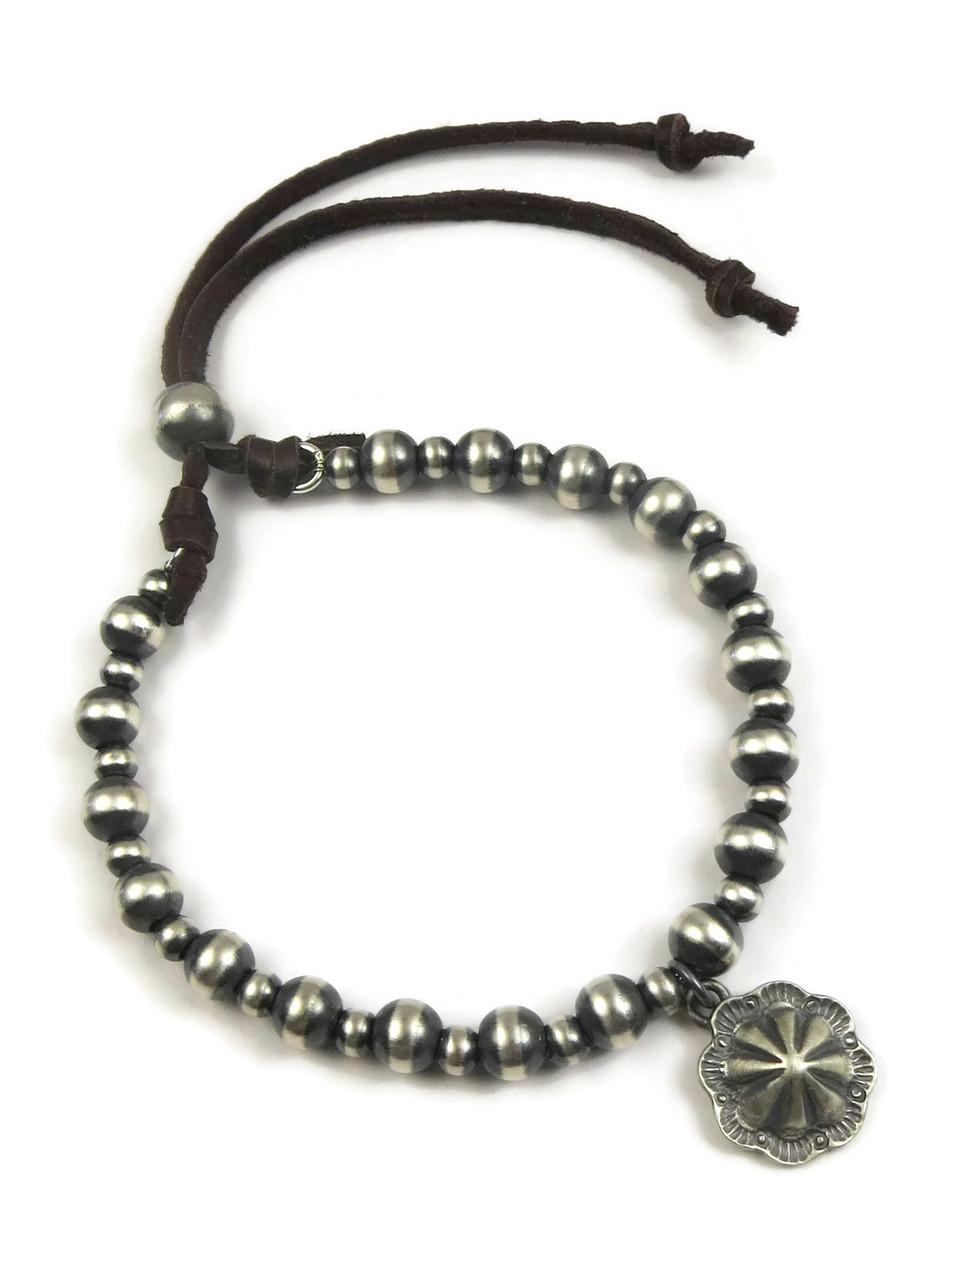 Silver Concho Bead Leather Bracelet